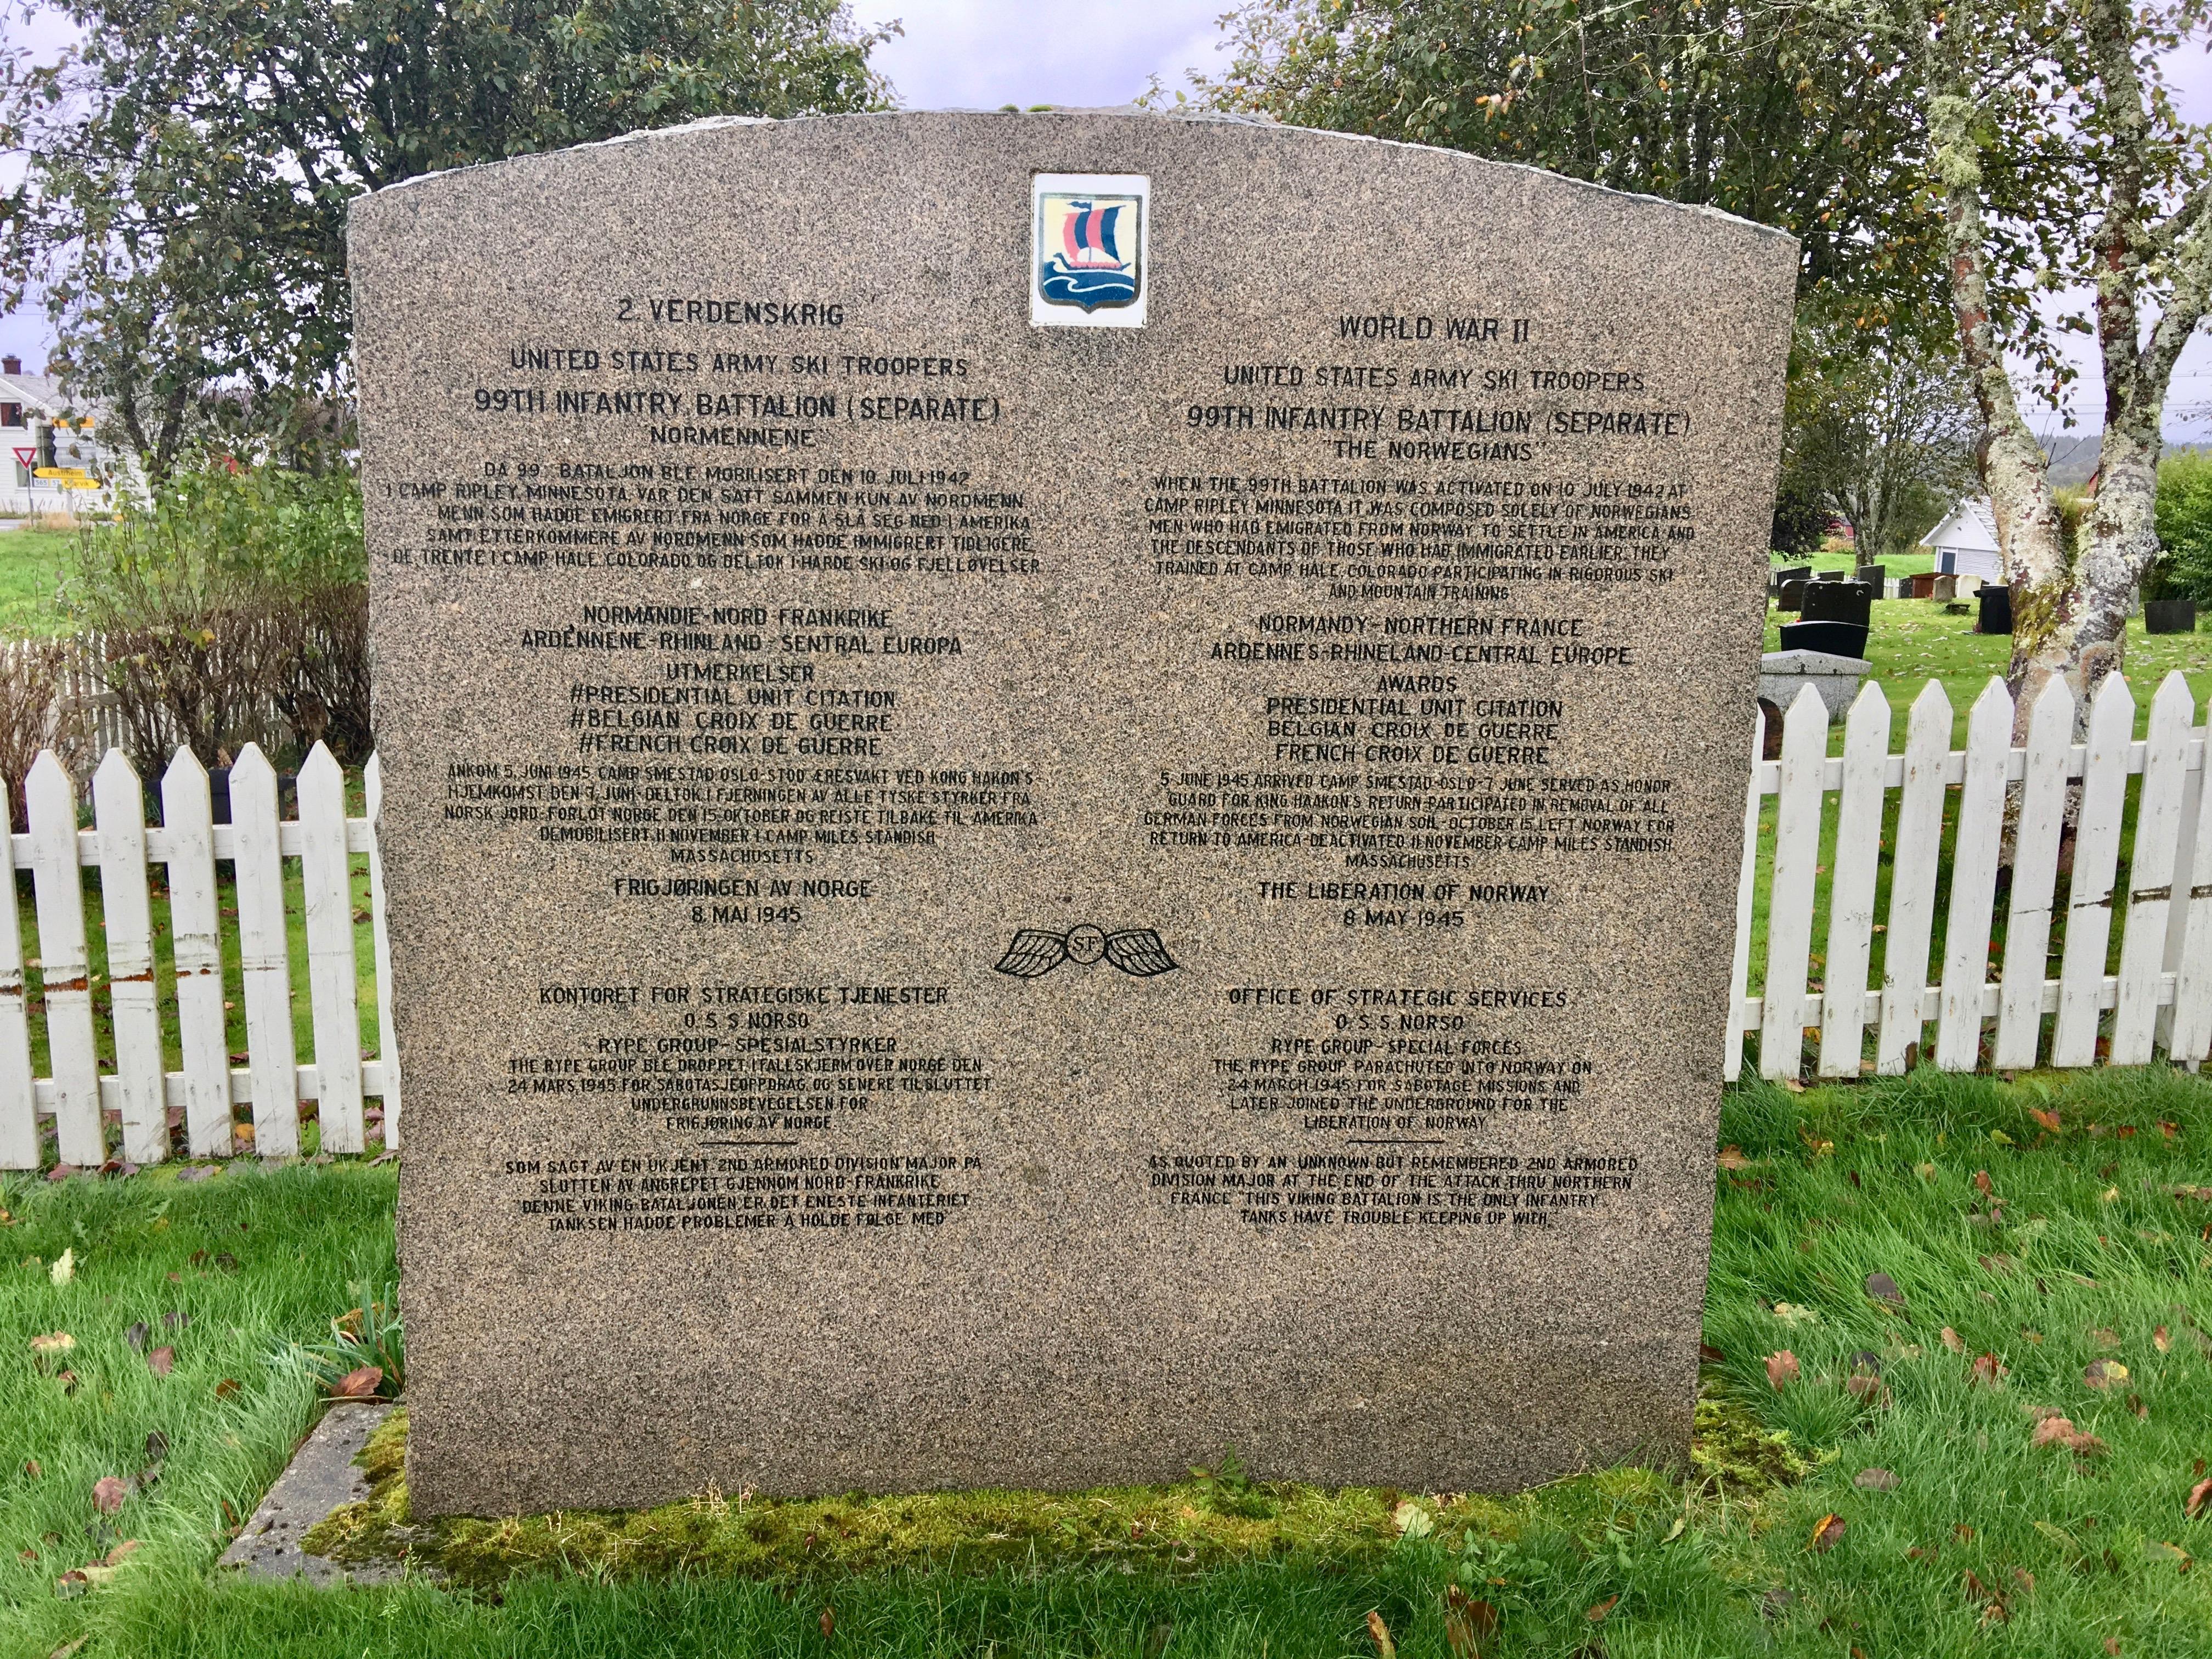 FileMinnesttte Memorial Stone 2 Verdenskrig WW2 US Army Ski Troopers 99th Infantry Battalion Office Of Strategic Services Ved Emigrantkyrkja